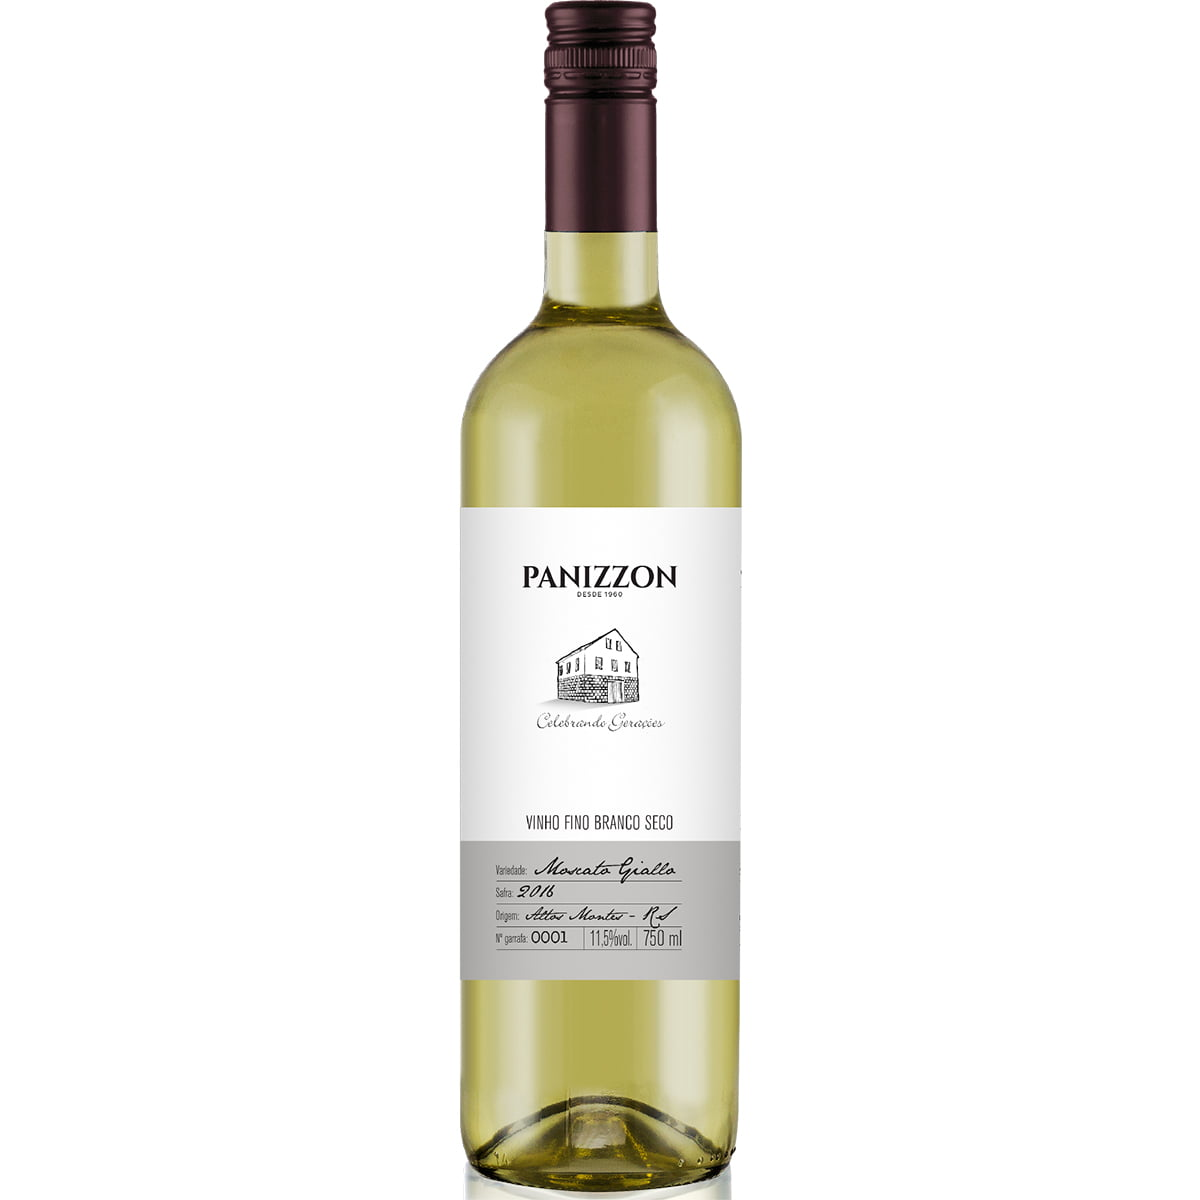 Vinho Panizzon Moscato Giallo Branco Seco 750ml